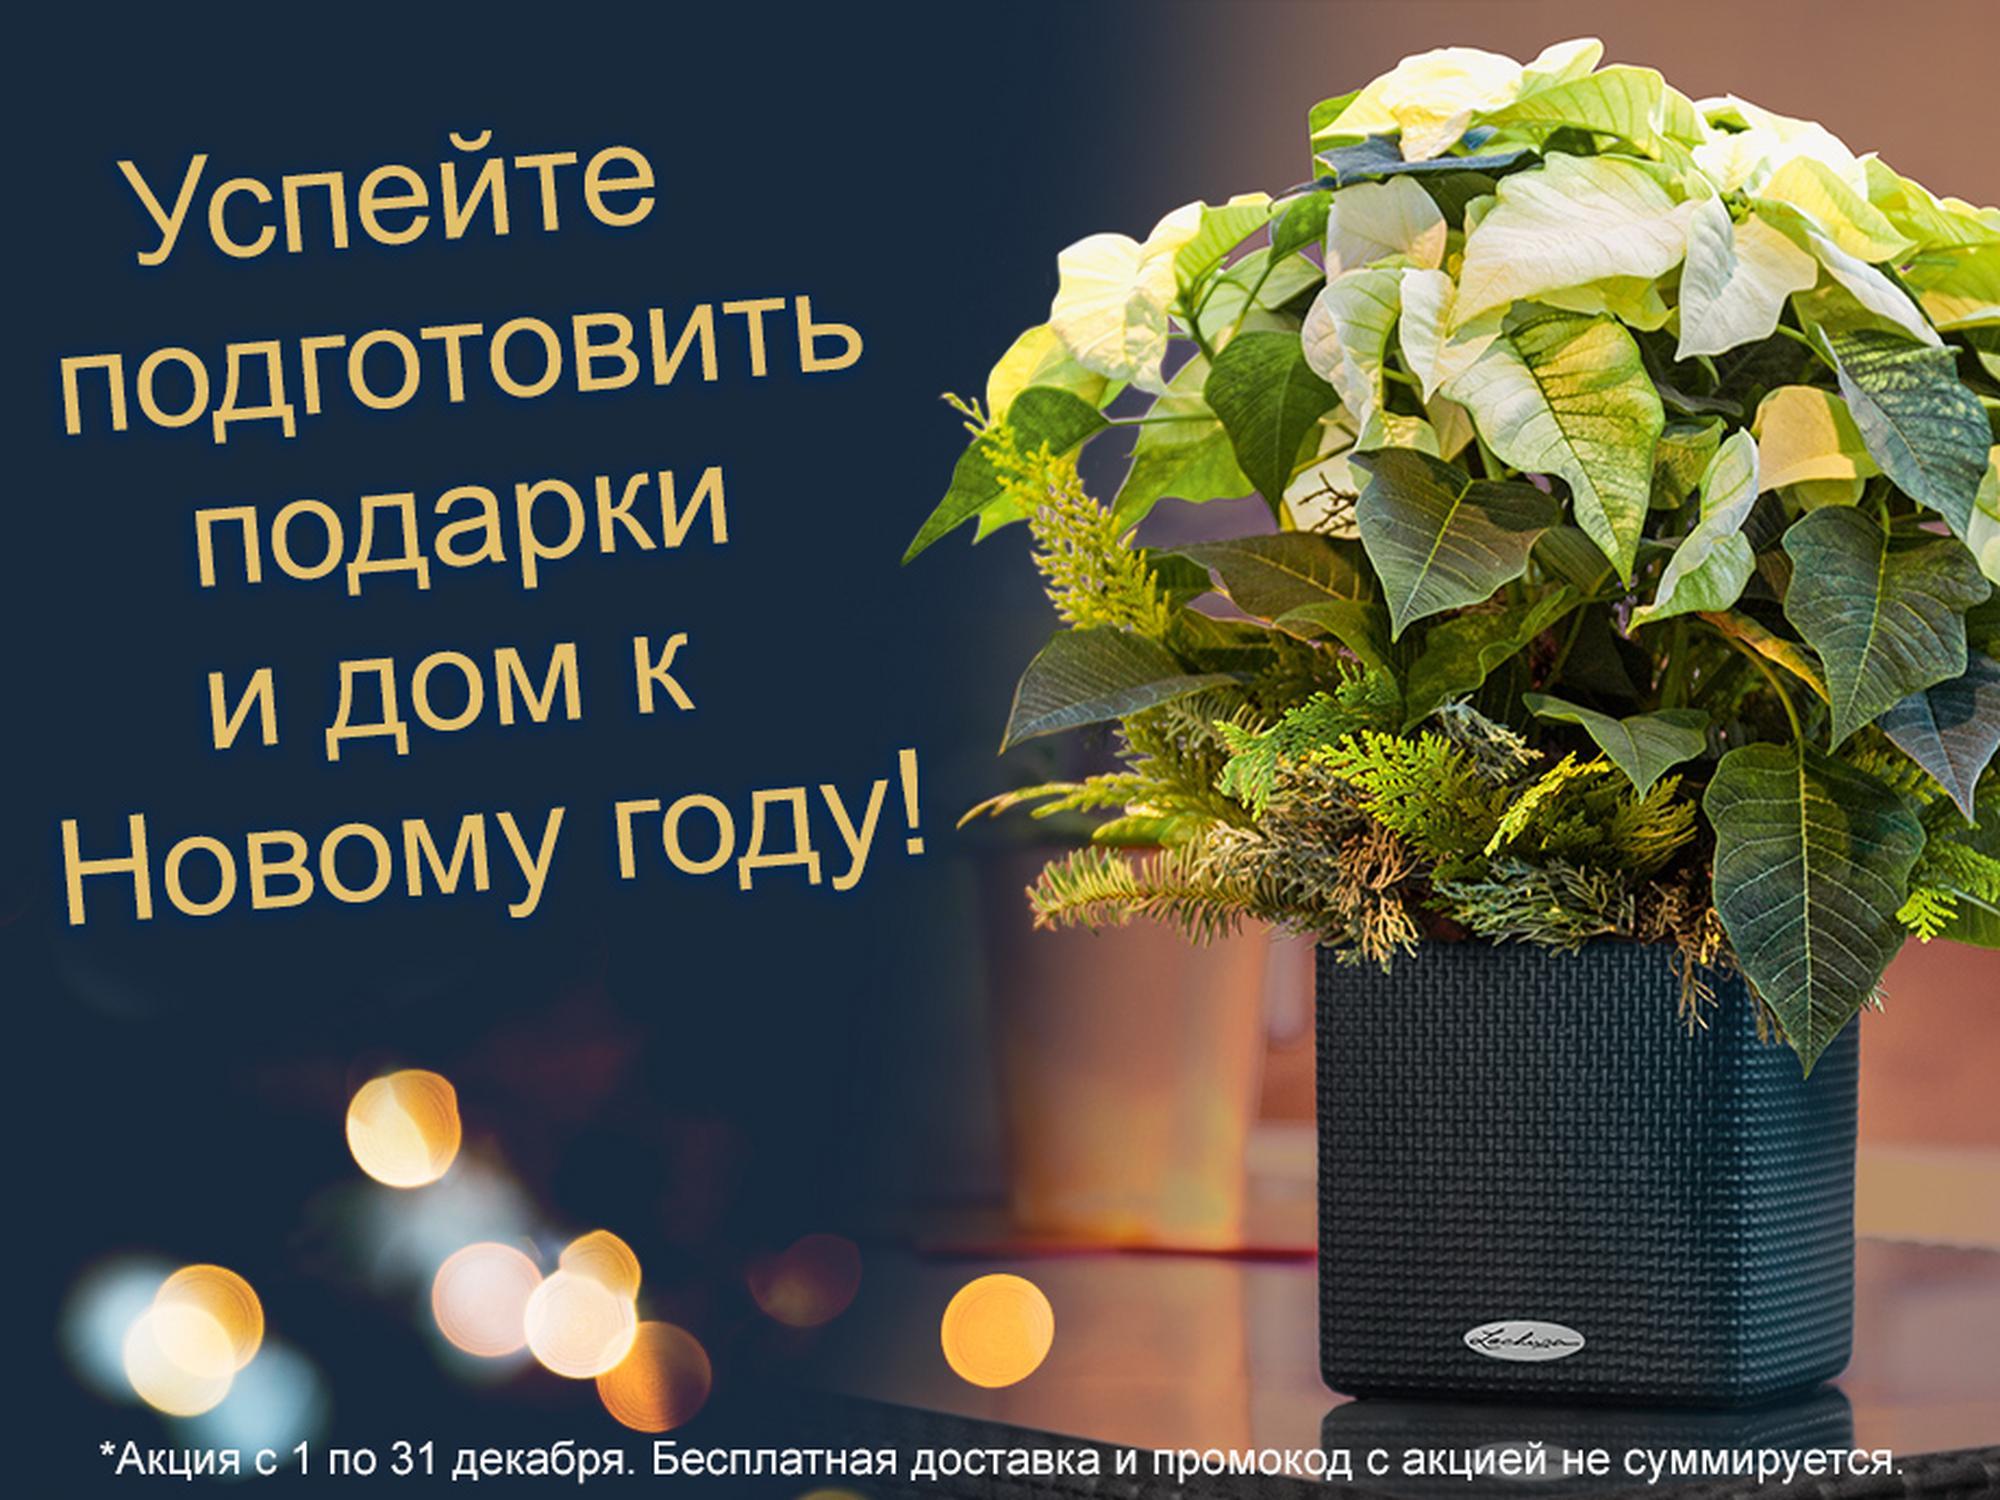 hero_banner_promo12-2019_xs_ru